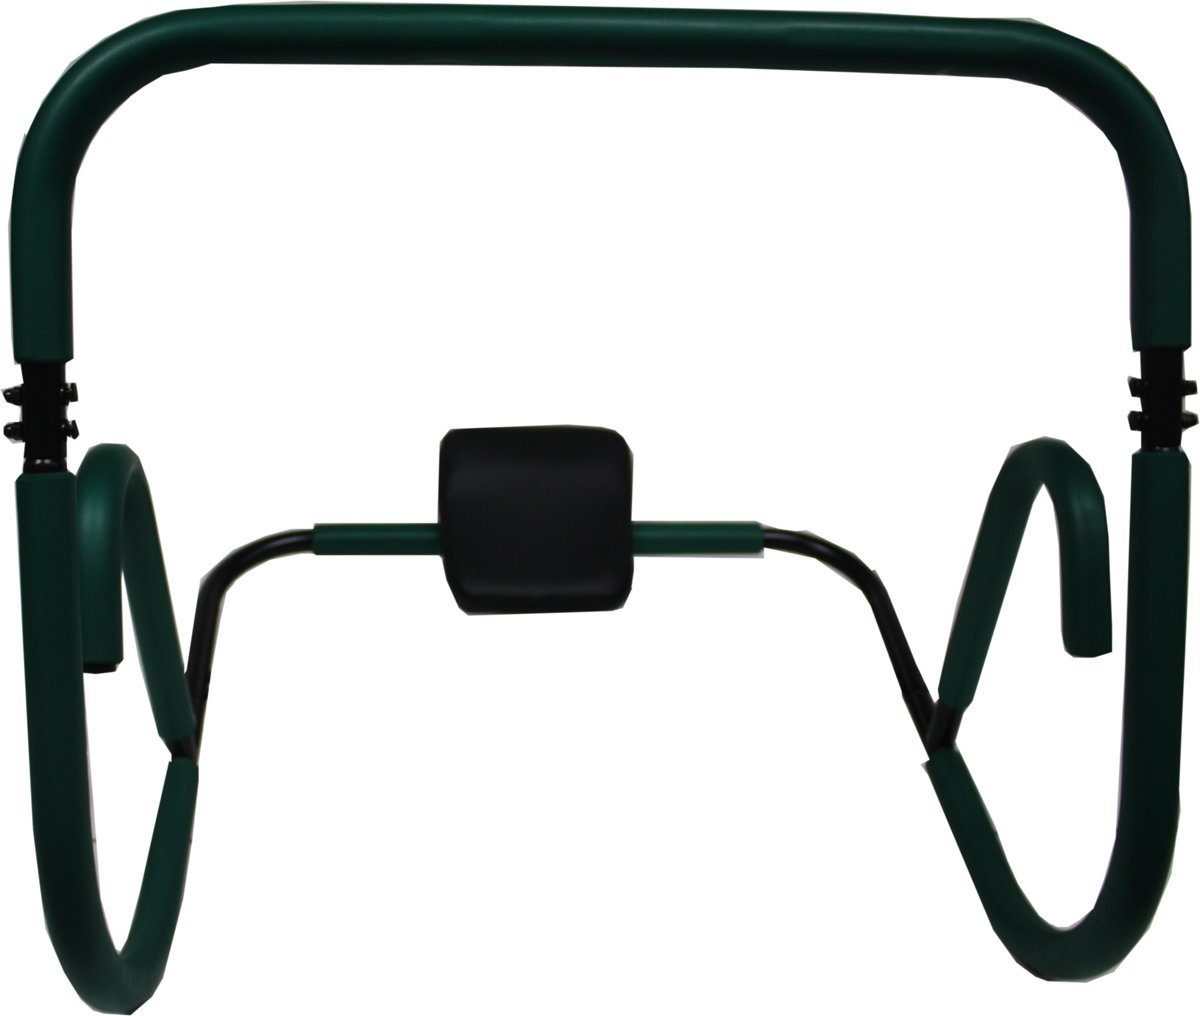 Buikspiertrainer - AB coach - AB roller kopen